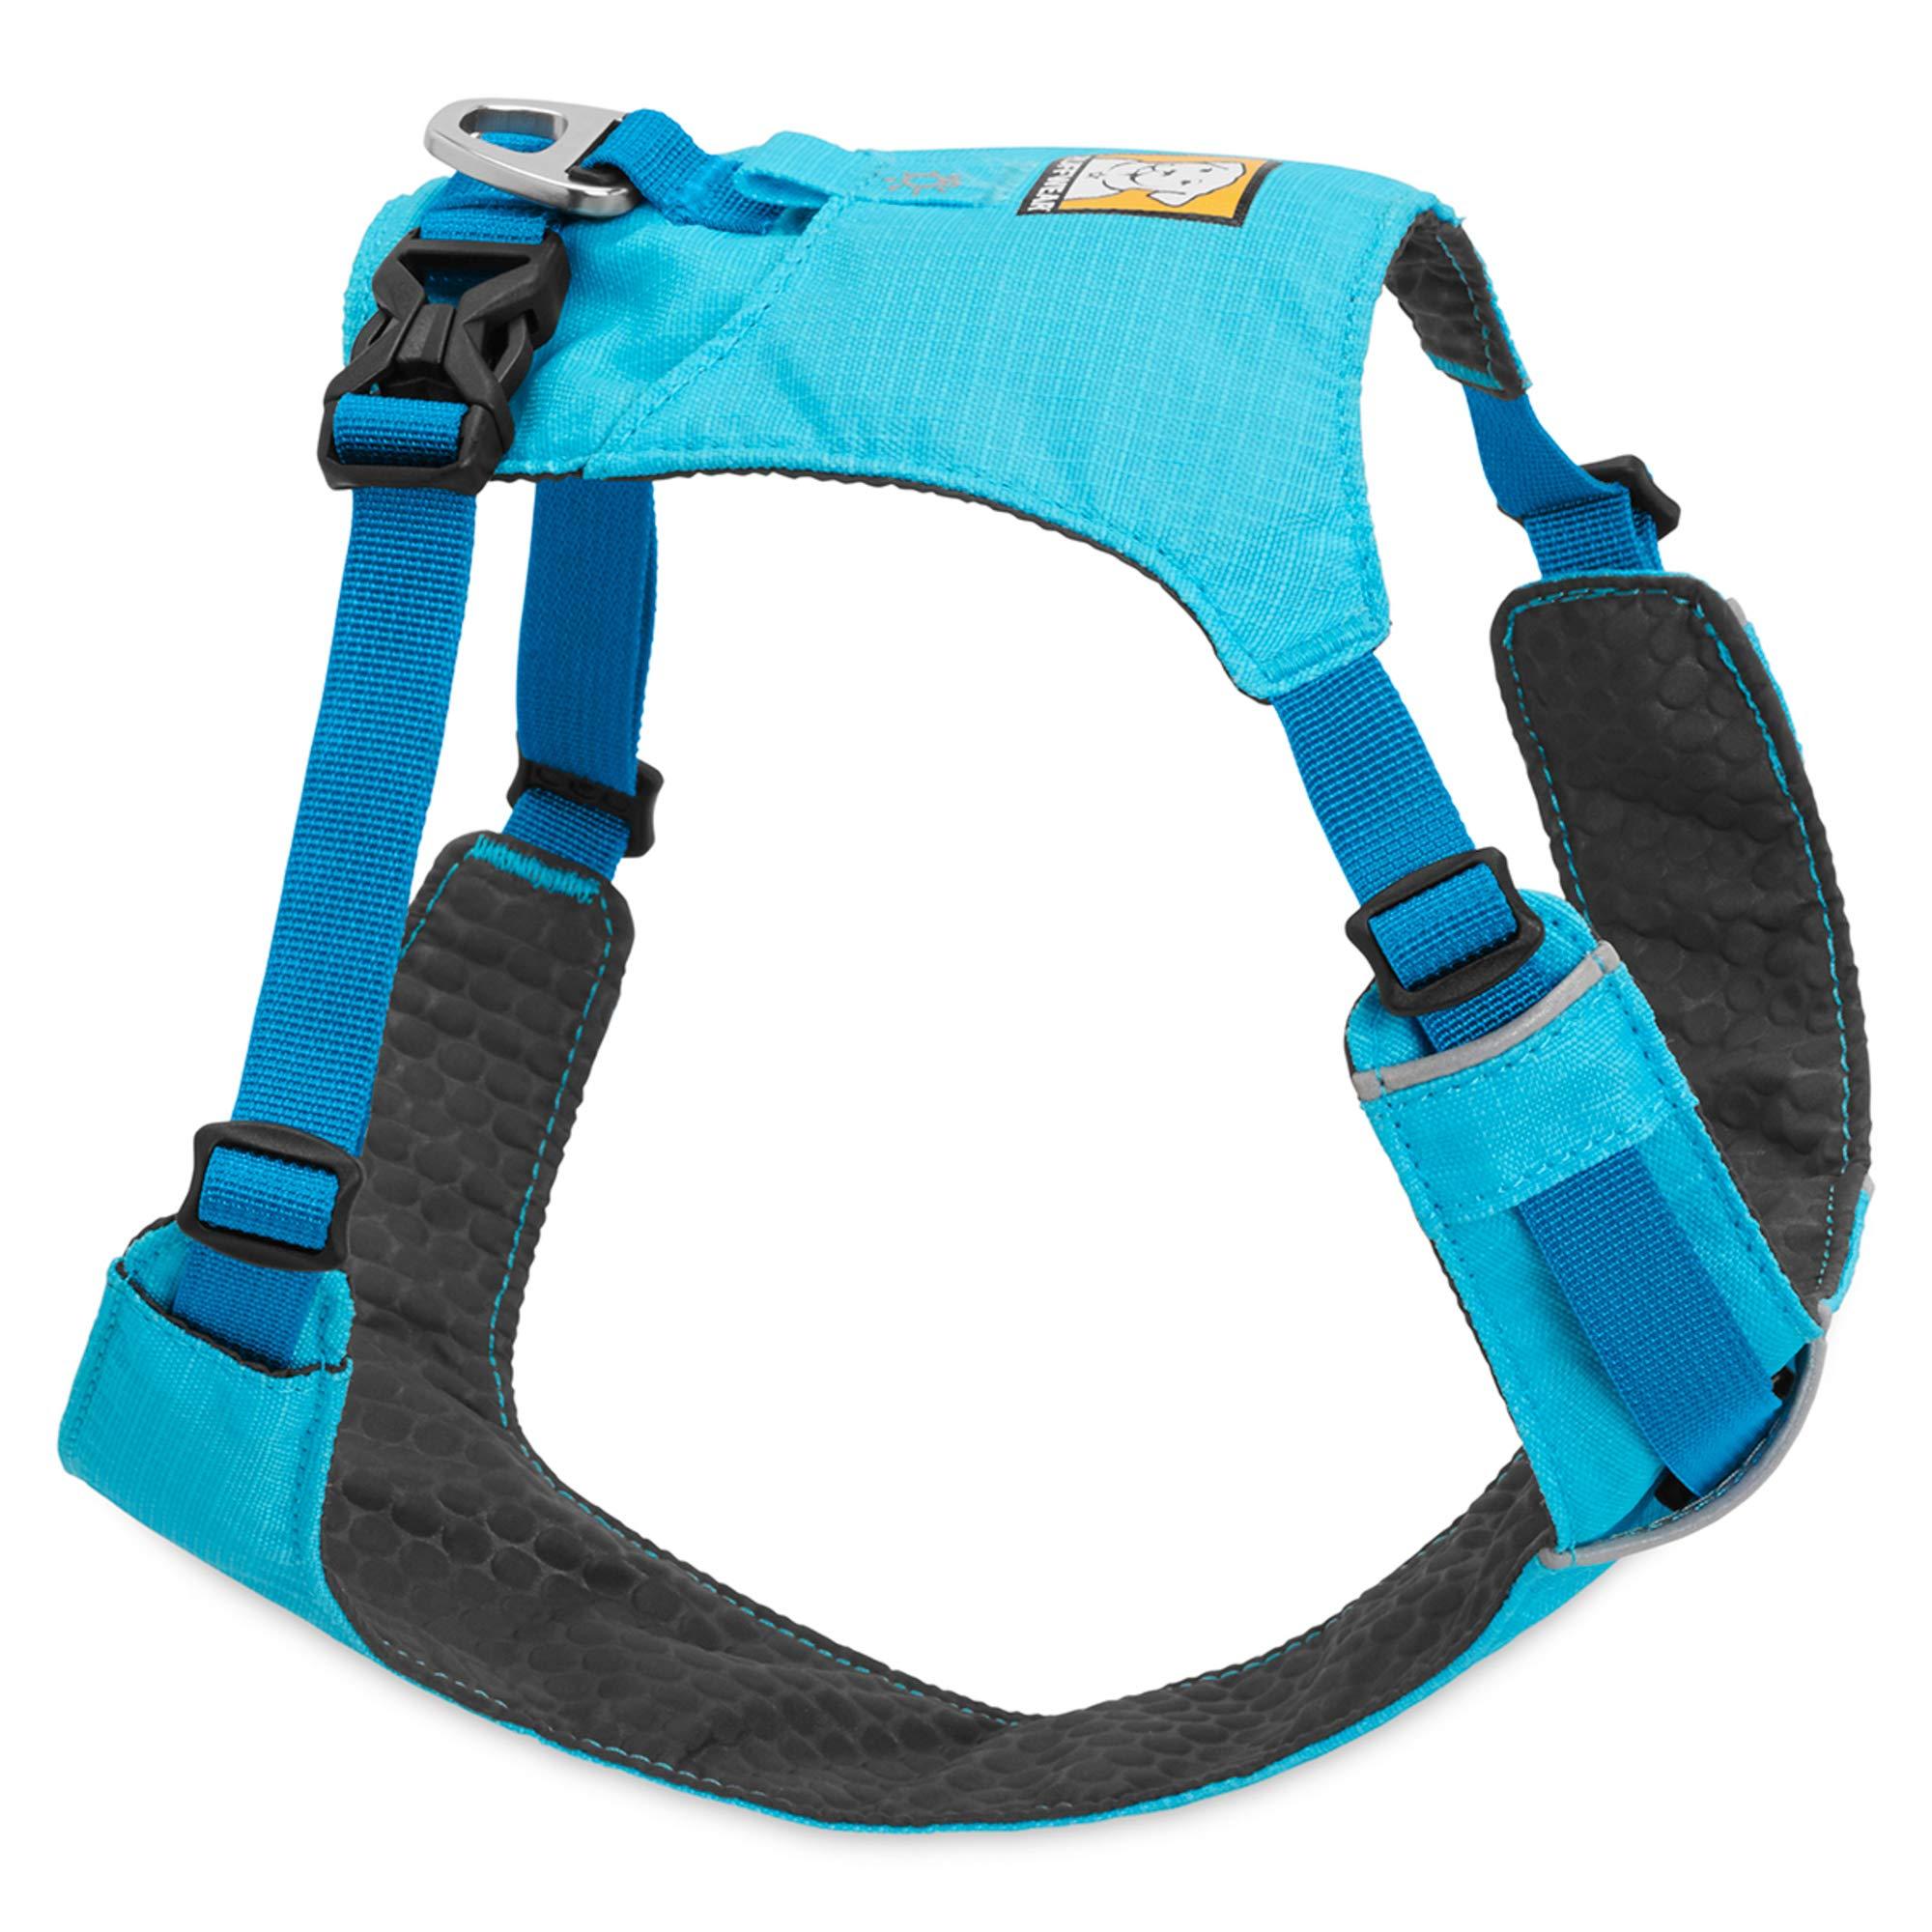 RUFFWEAR Lightweight Dog Harness, Very Small Breeds, Adjustable Fit, Size: X-Small, Blue Atoll, Hi & Light Harness, 3082-409S1 by RUFFWEAR